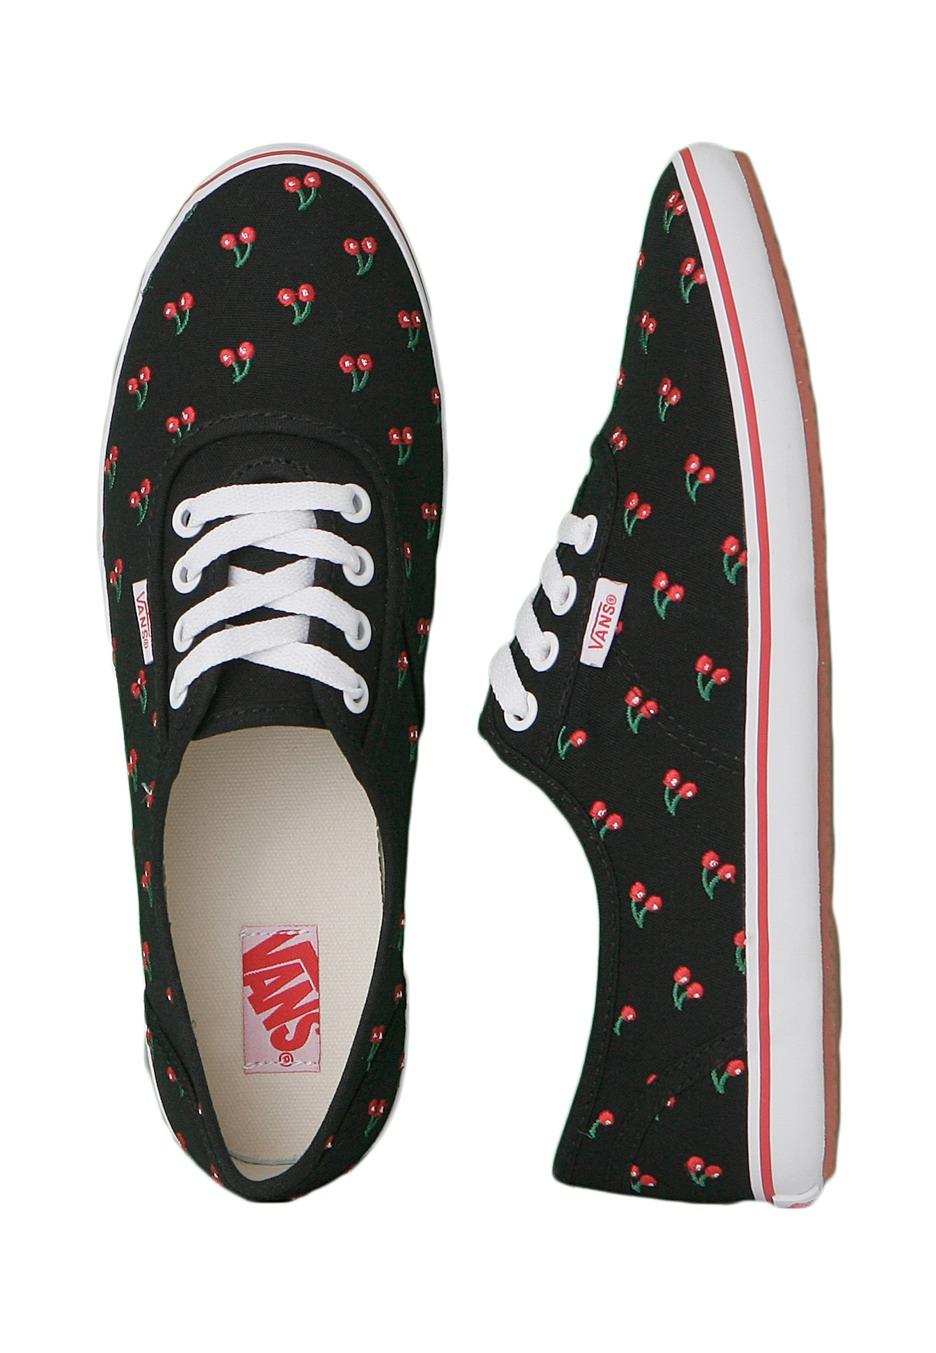 Vans - Cedar Cherries - Girl Shoes - Impericon.com UK